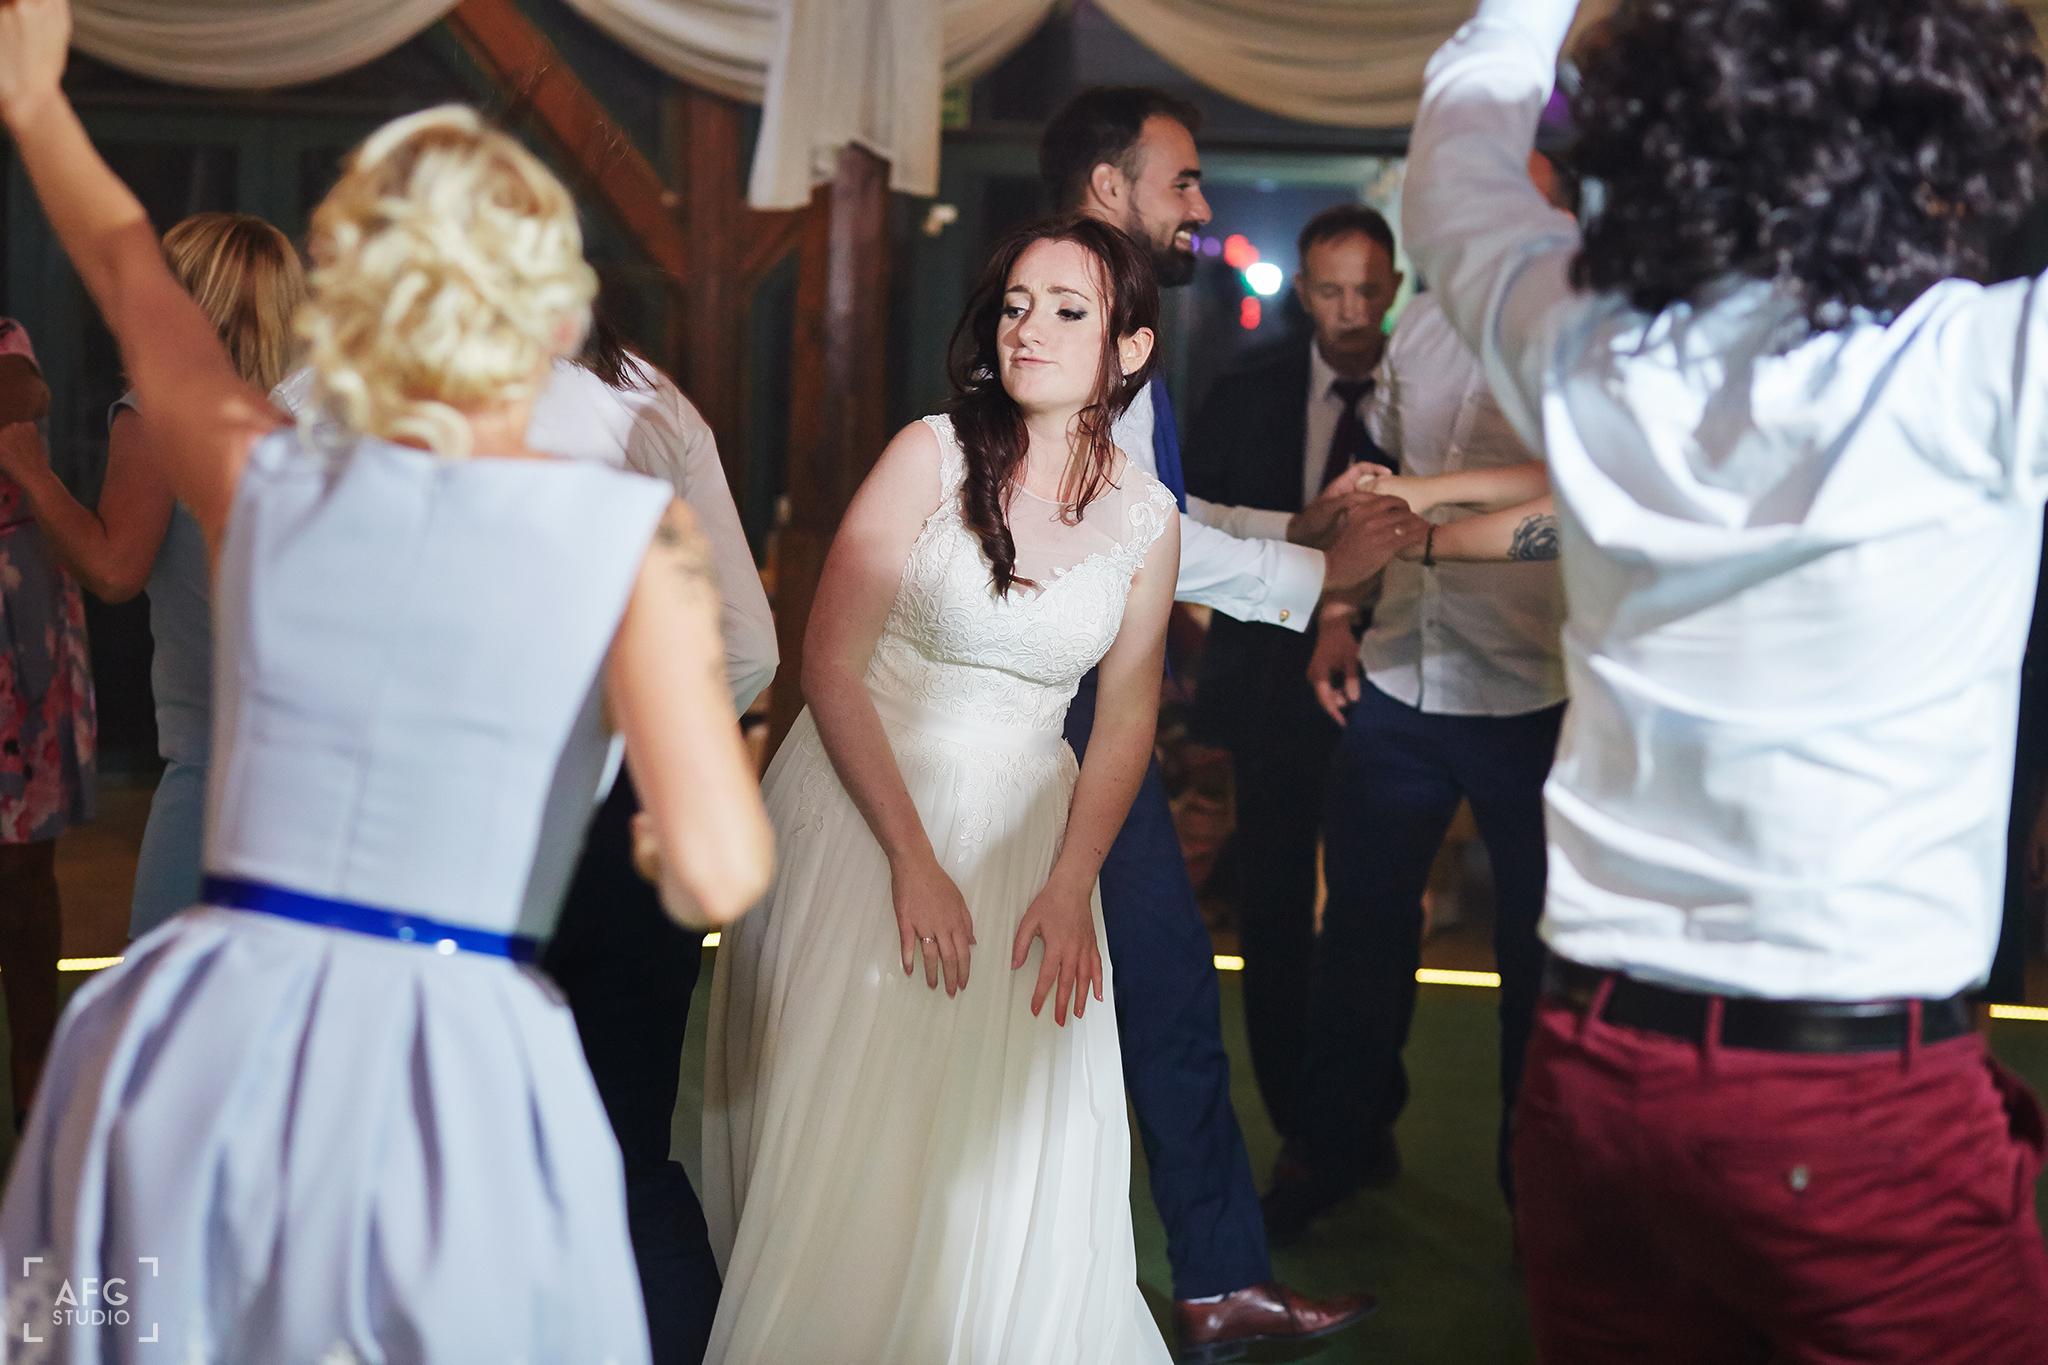 zabawa, wesele, taniec